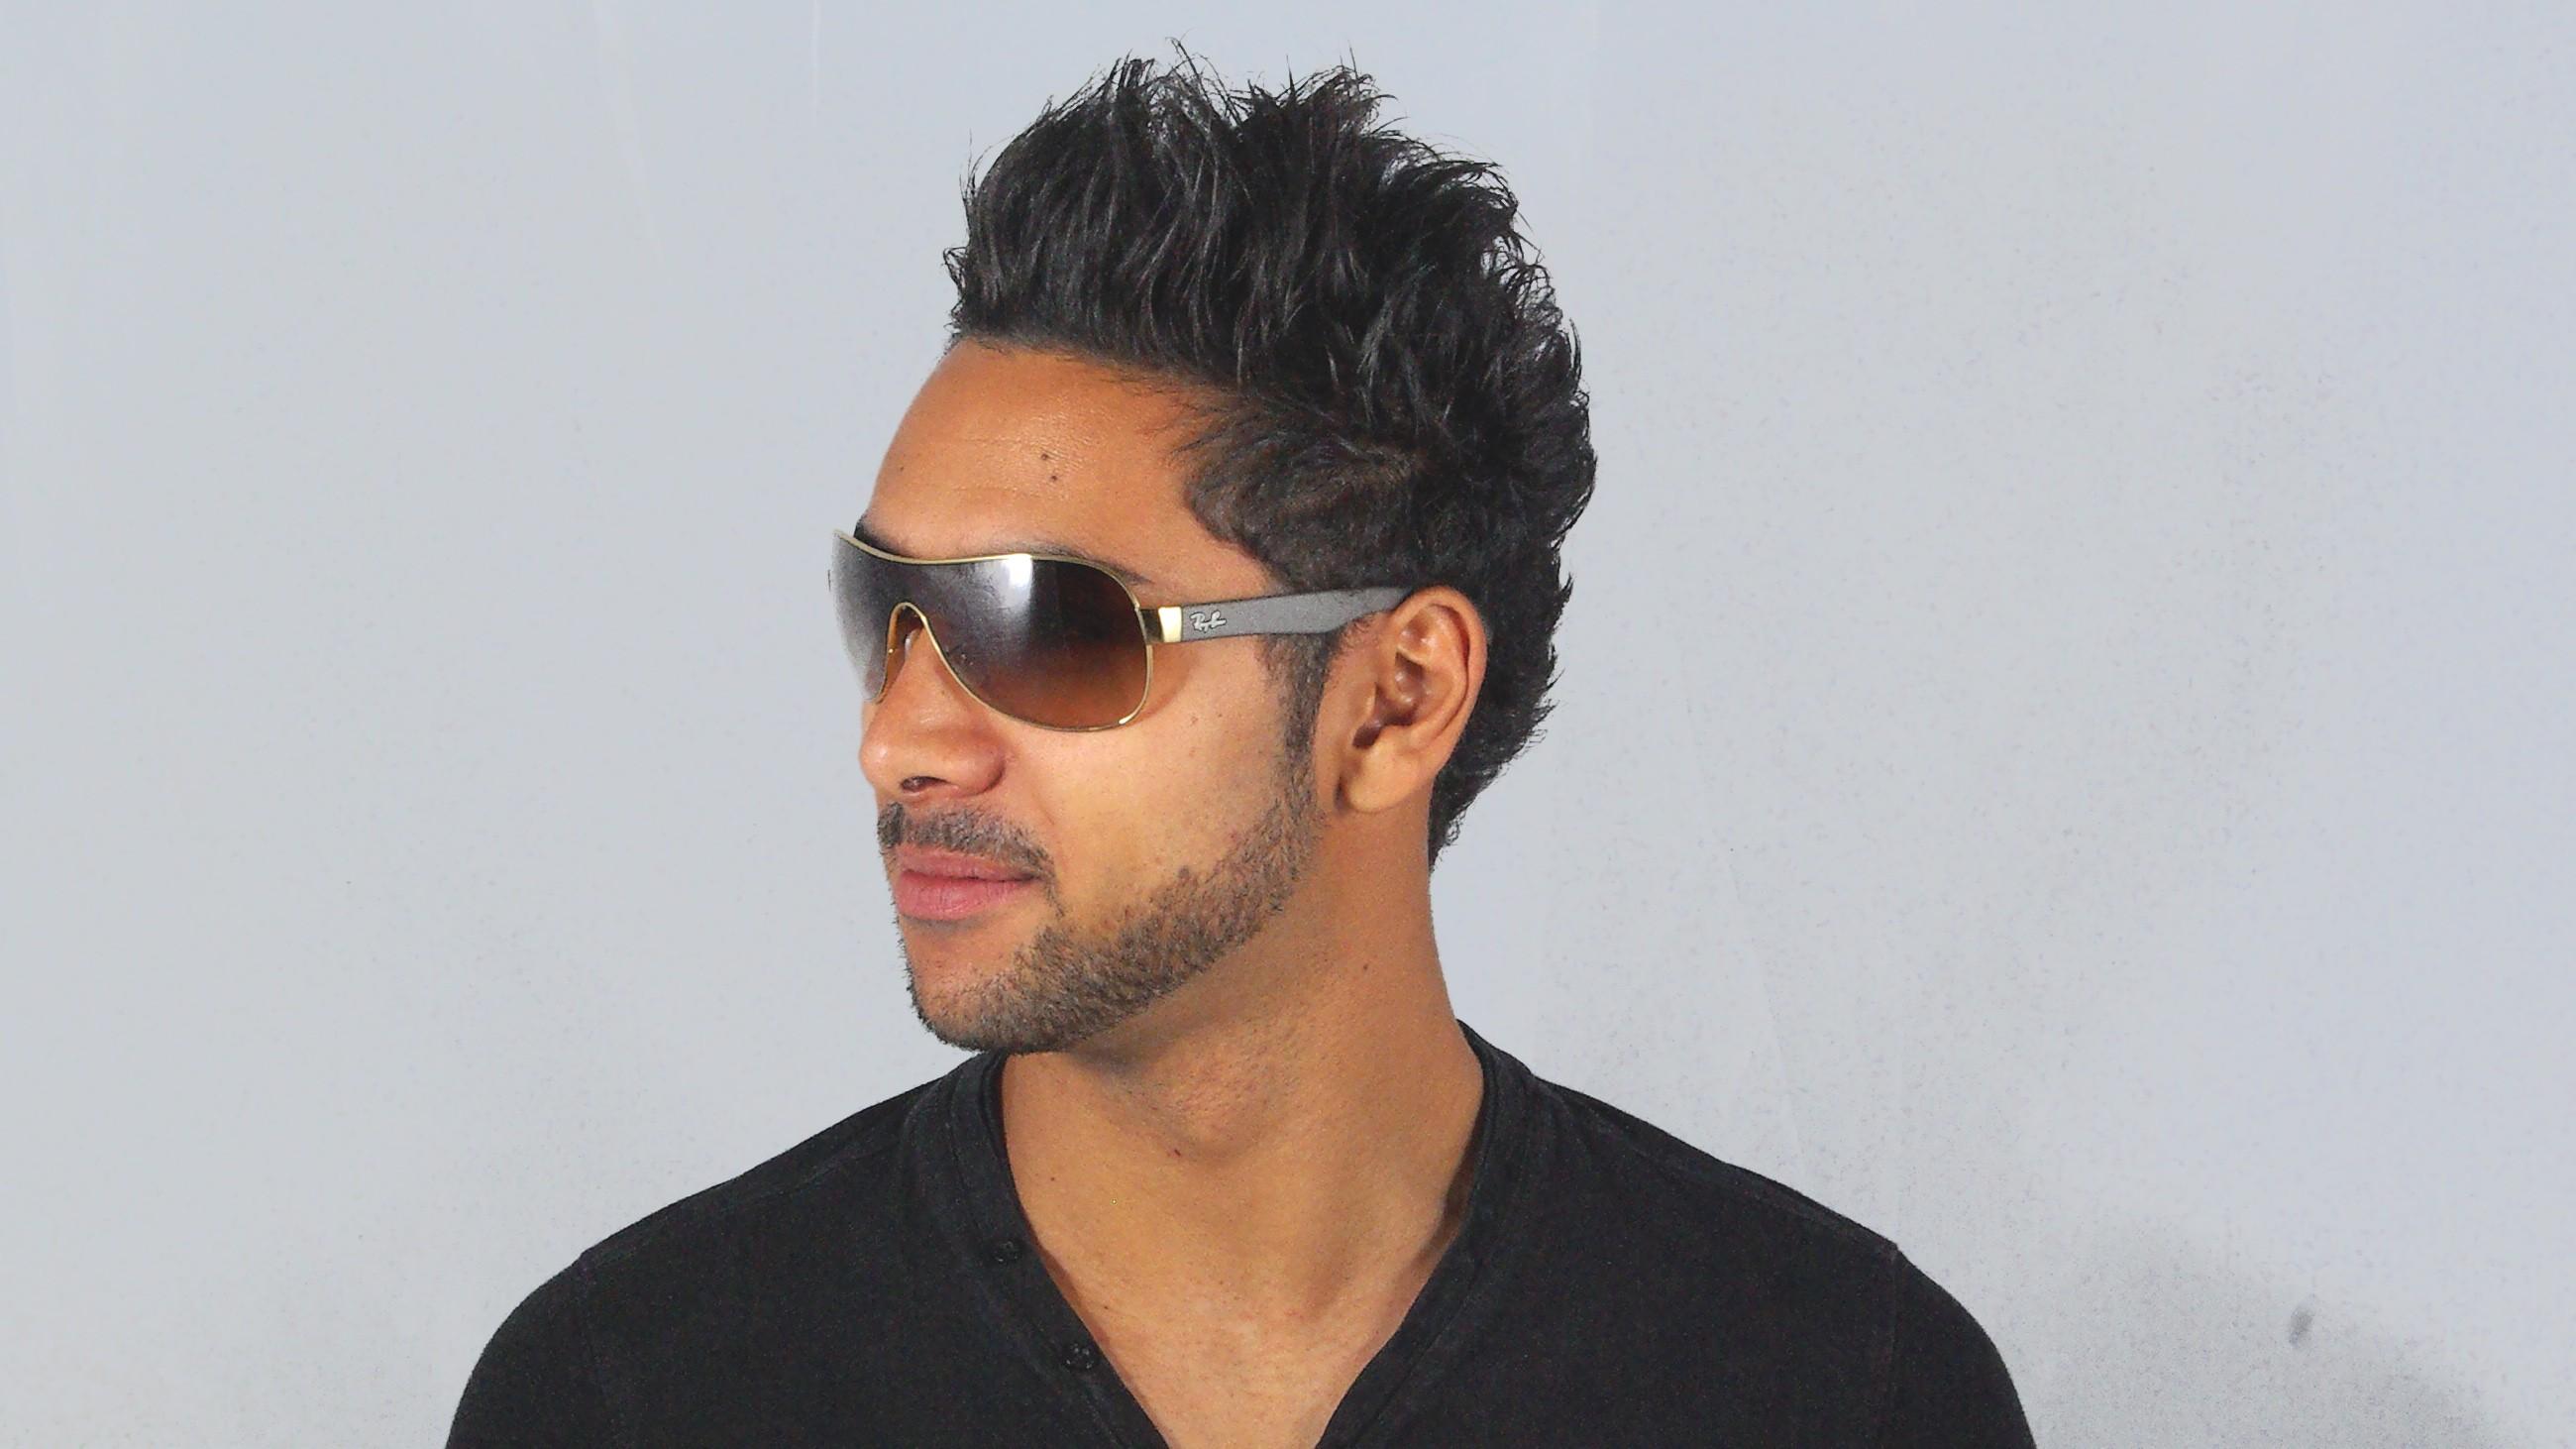 139f7b857bb Aaa Ray Ban Sunglasses Ebay. Aaa Ray Bans Uk